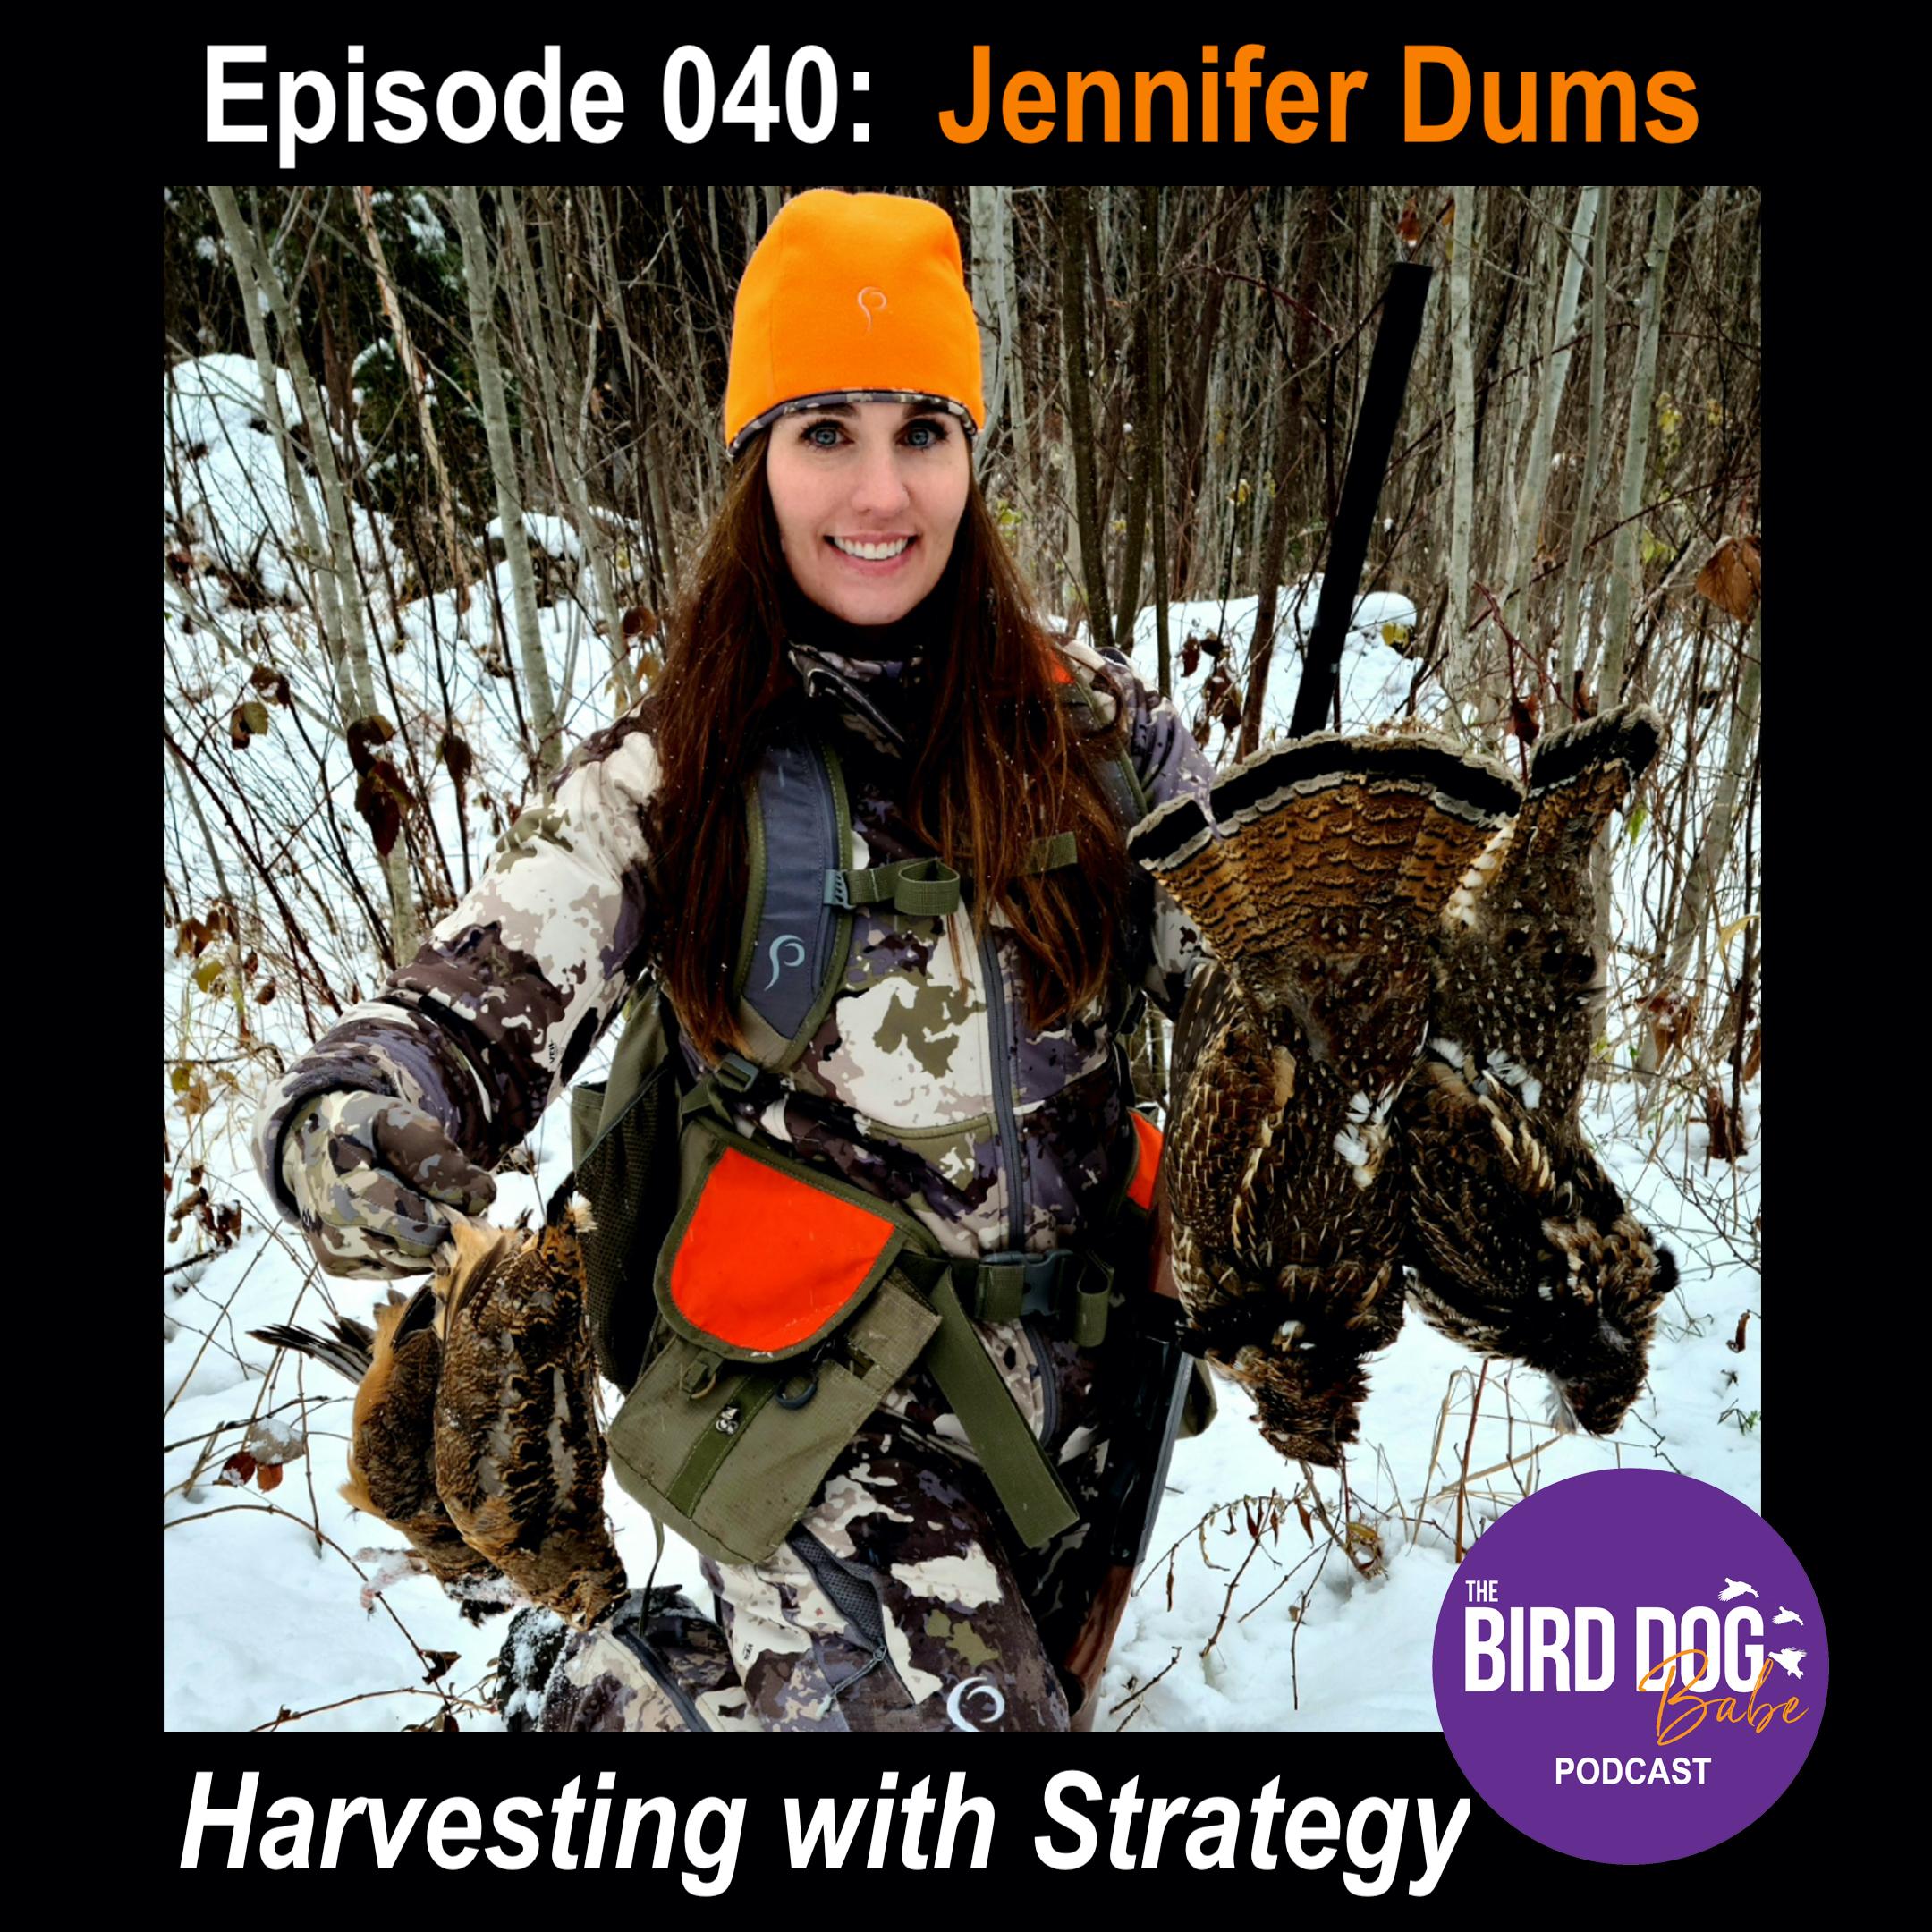 Episode 040: Harvesting with Strategy w/ Jennifer Dums